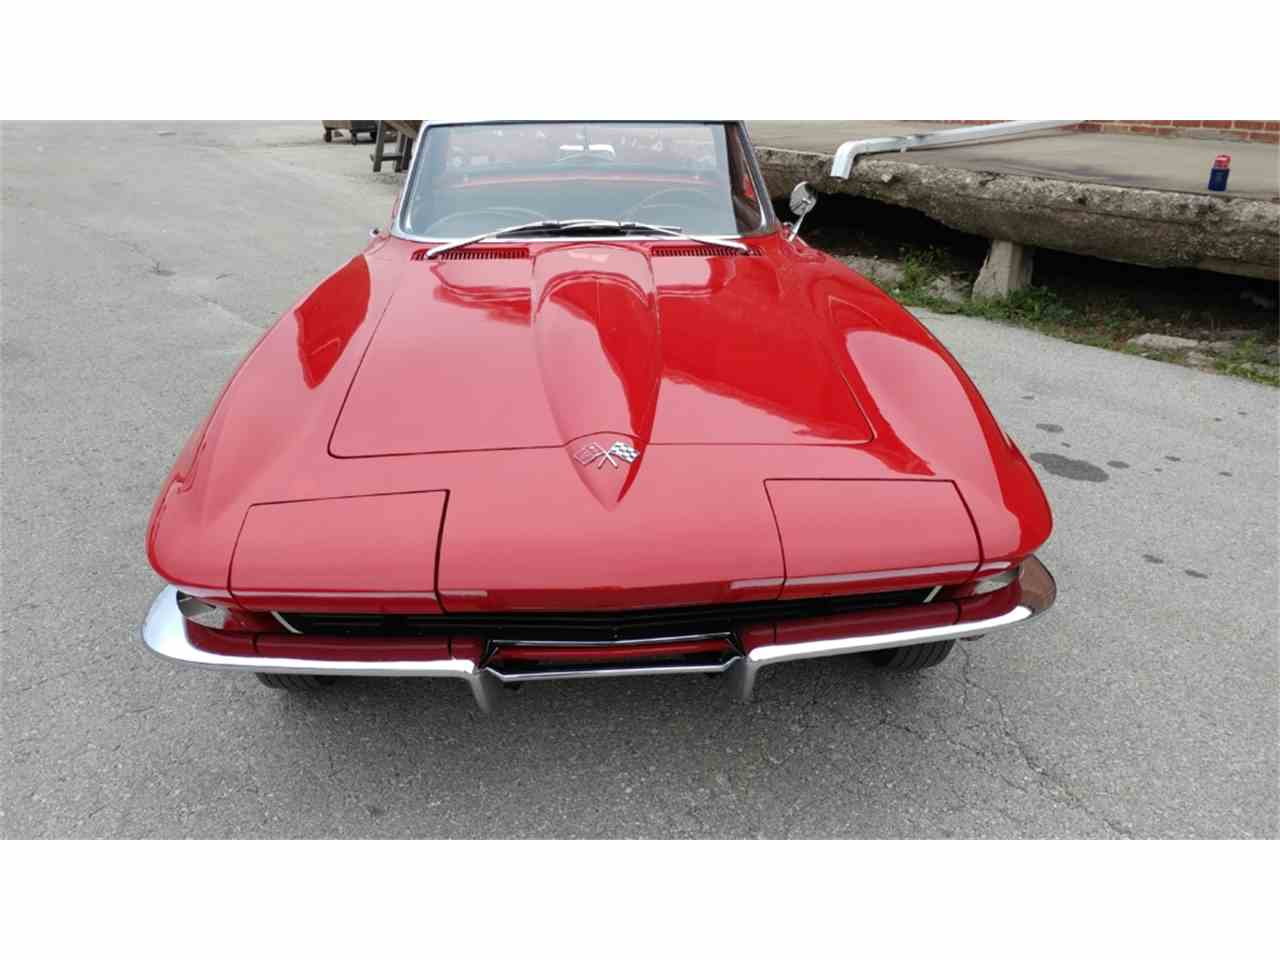 Large Picture of Classic 1965 Corvette located in Missouri - $69,995.00 - MO2I